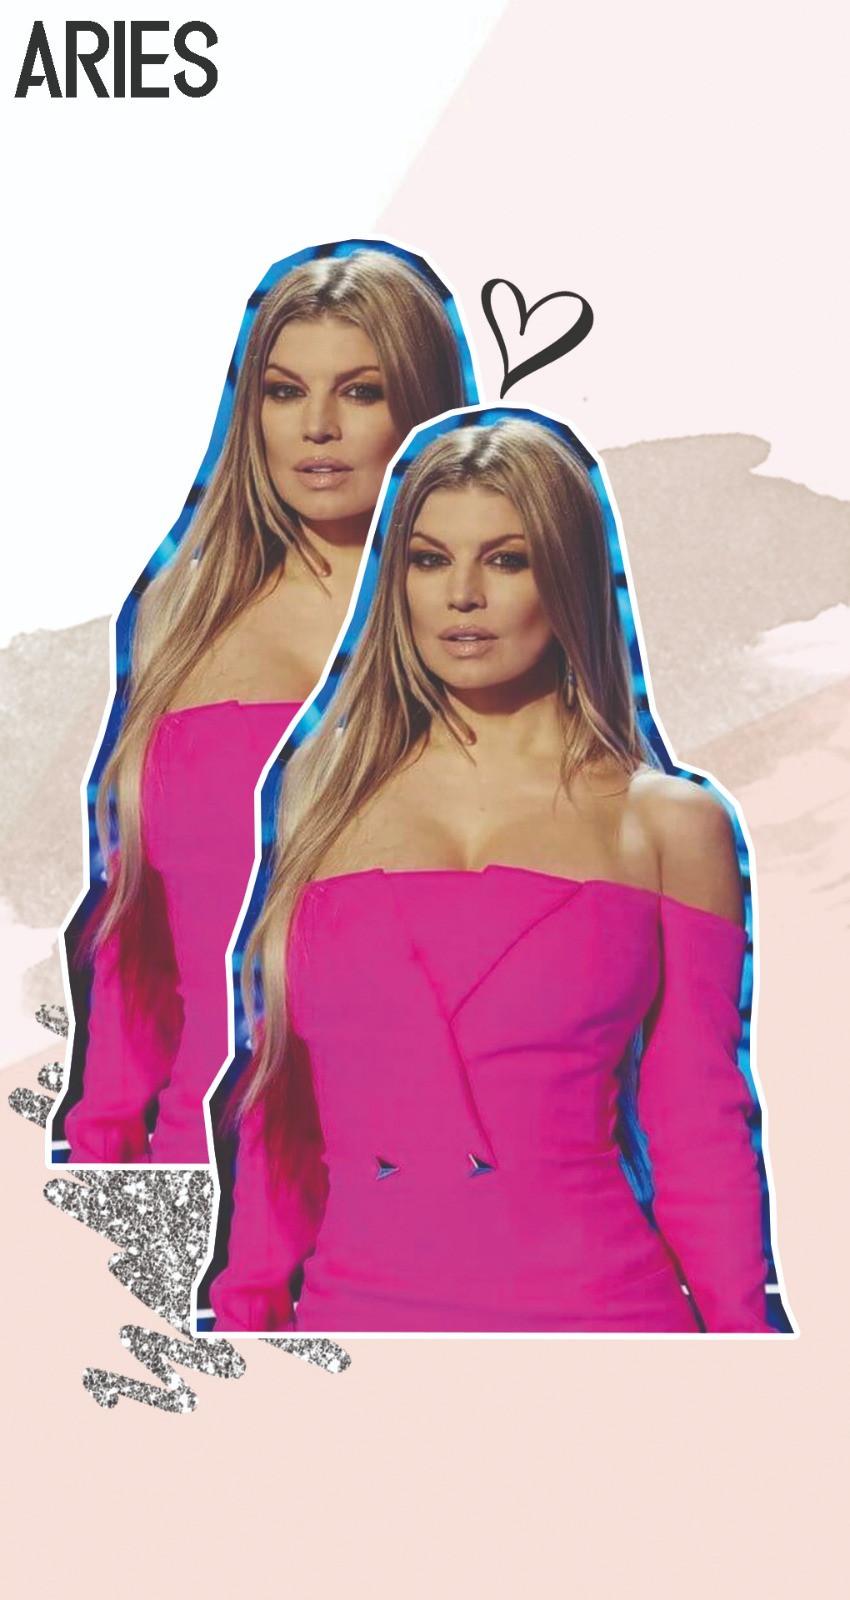 Fergie image via Getty